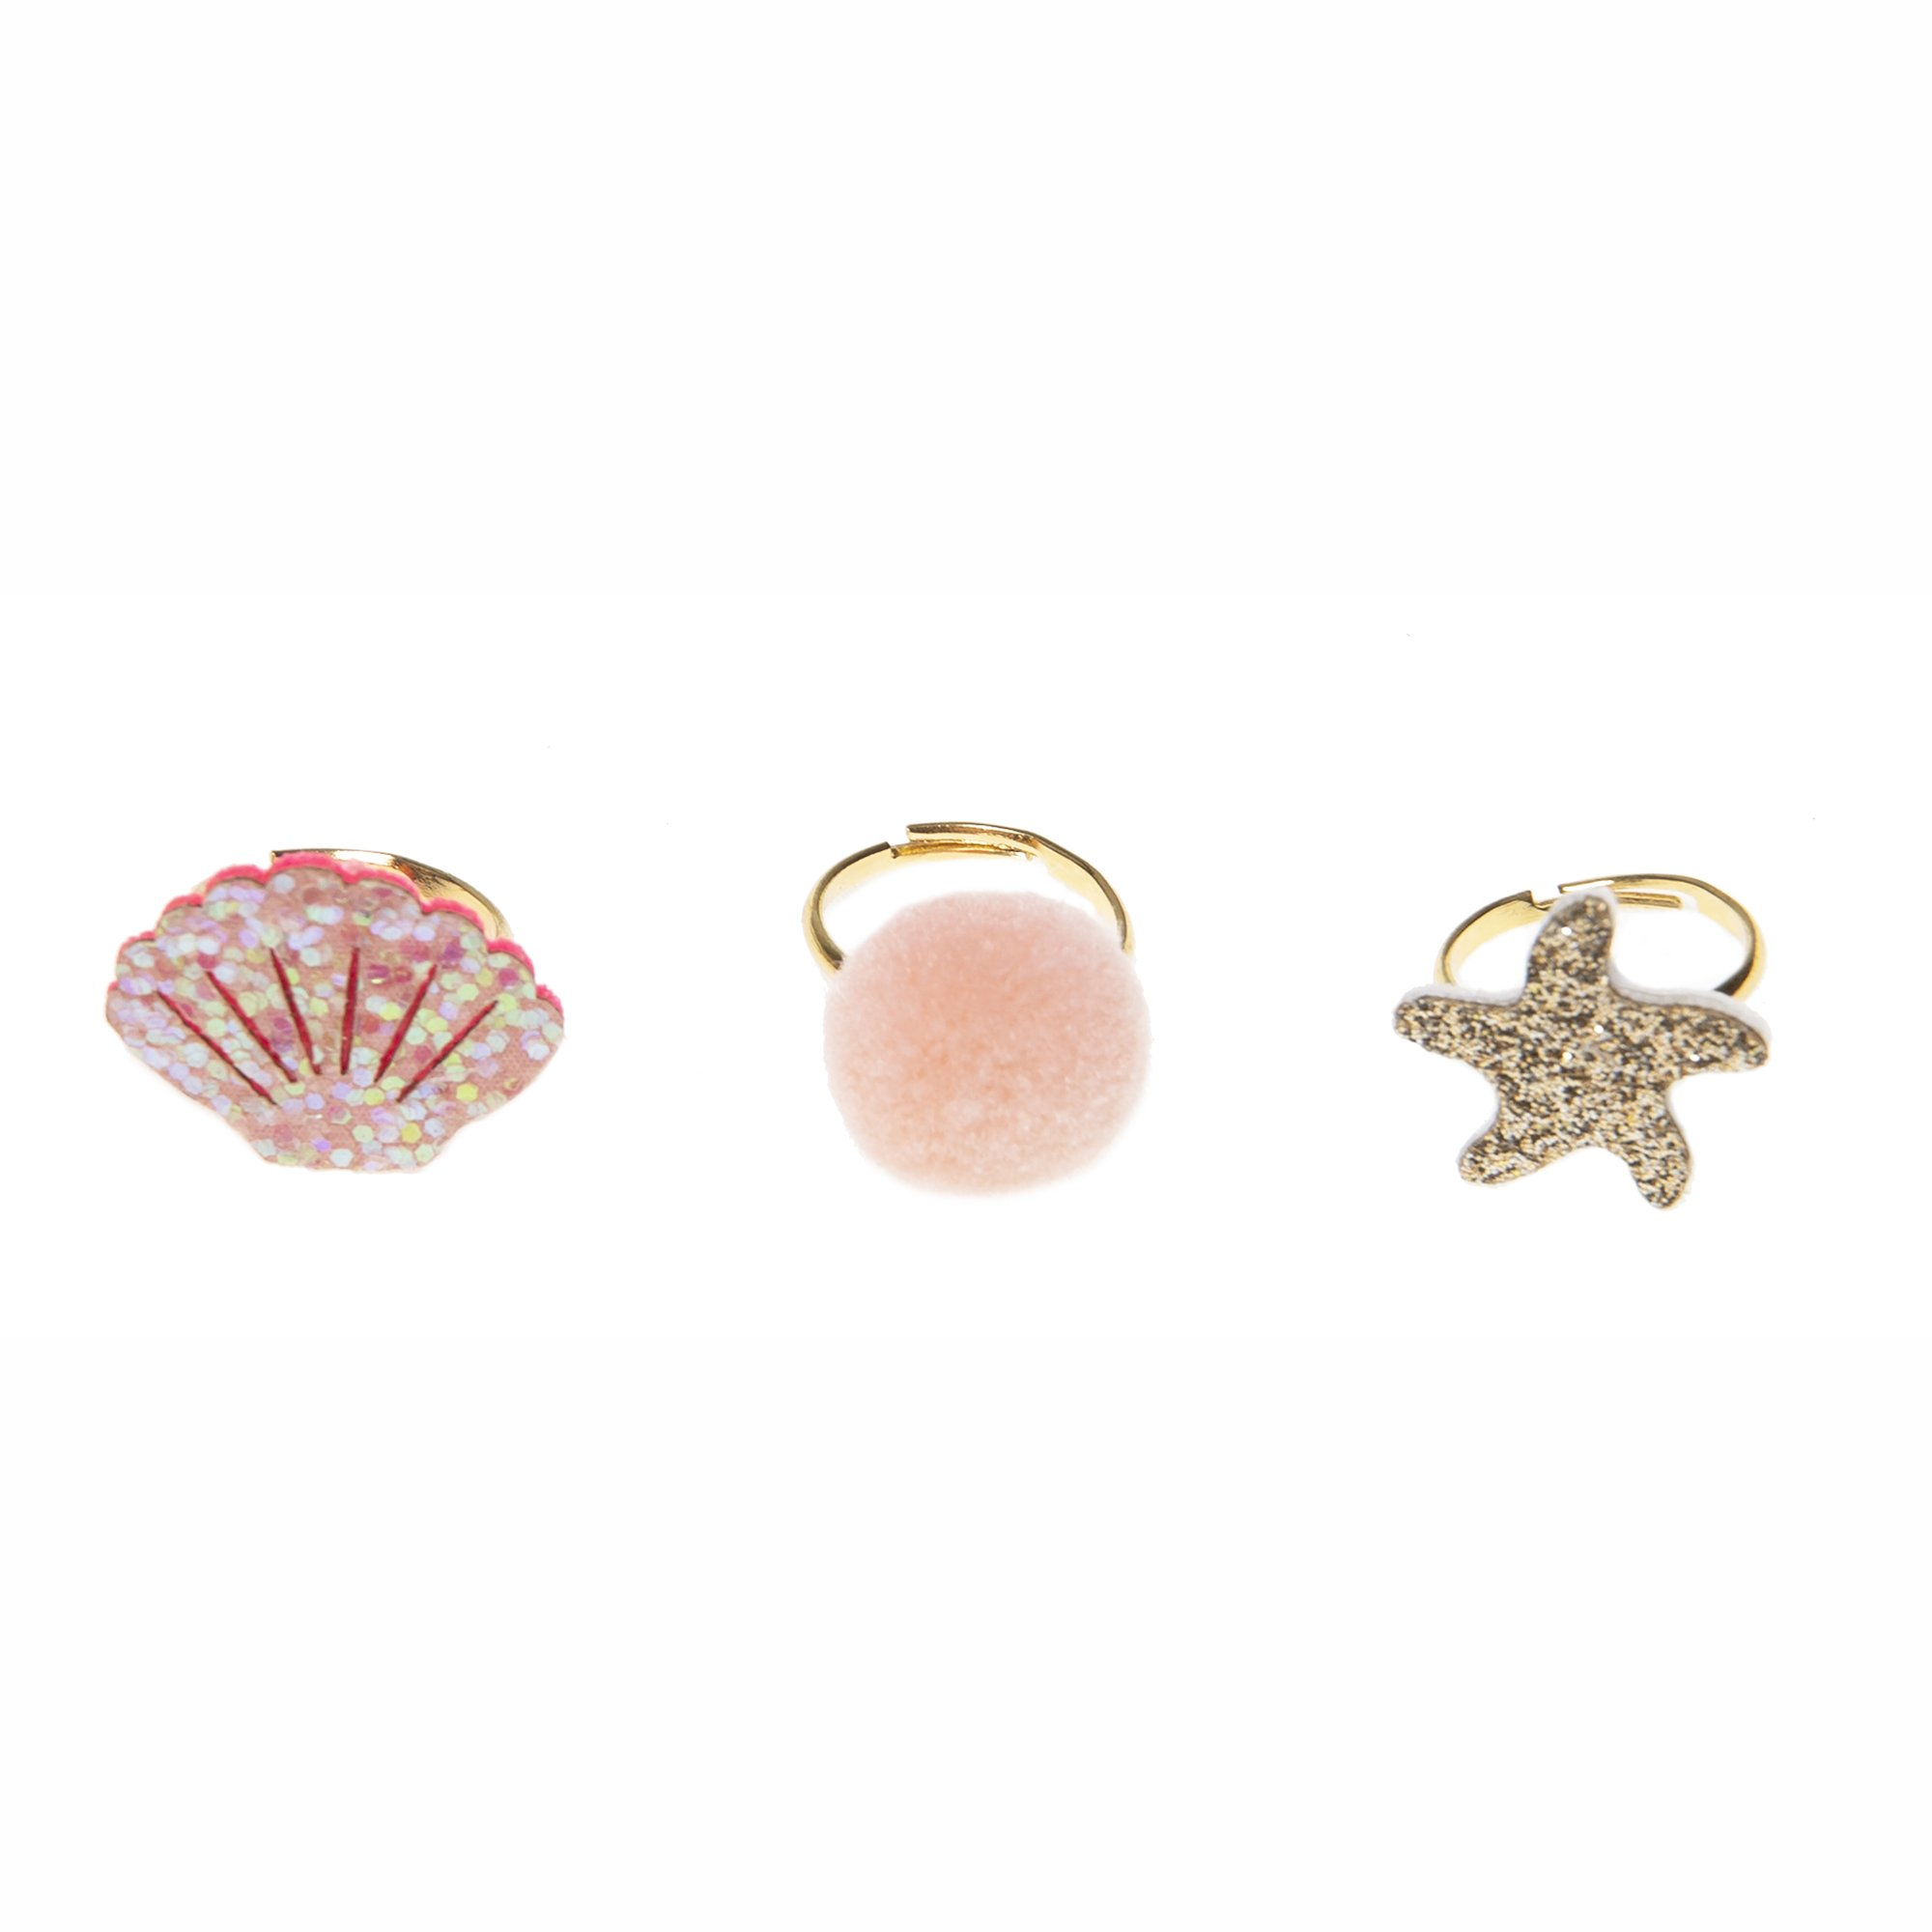 Rockahula Shimmer Shell Ring Set